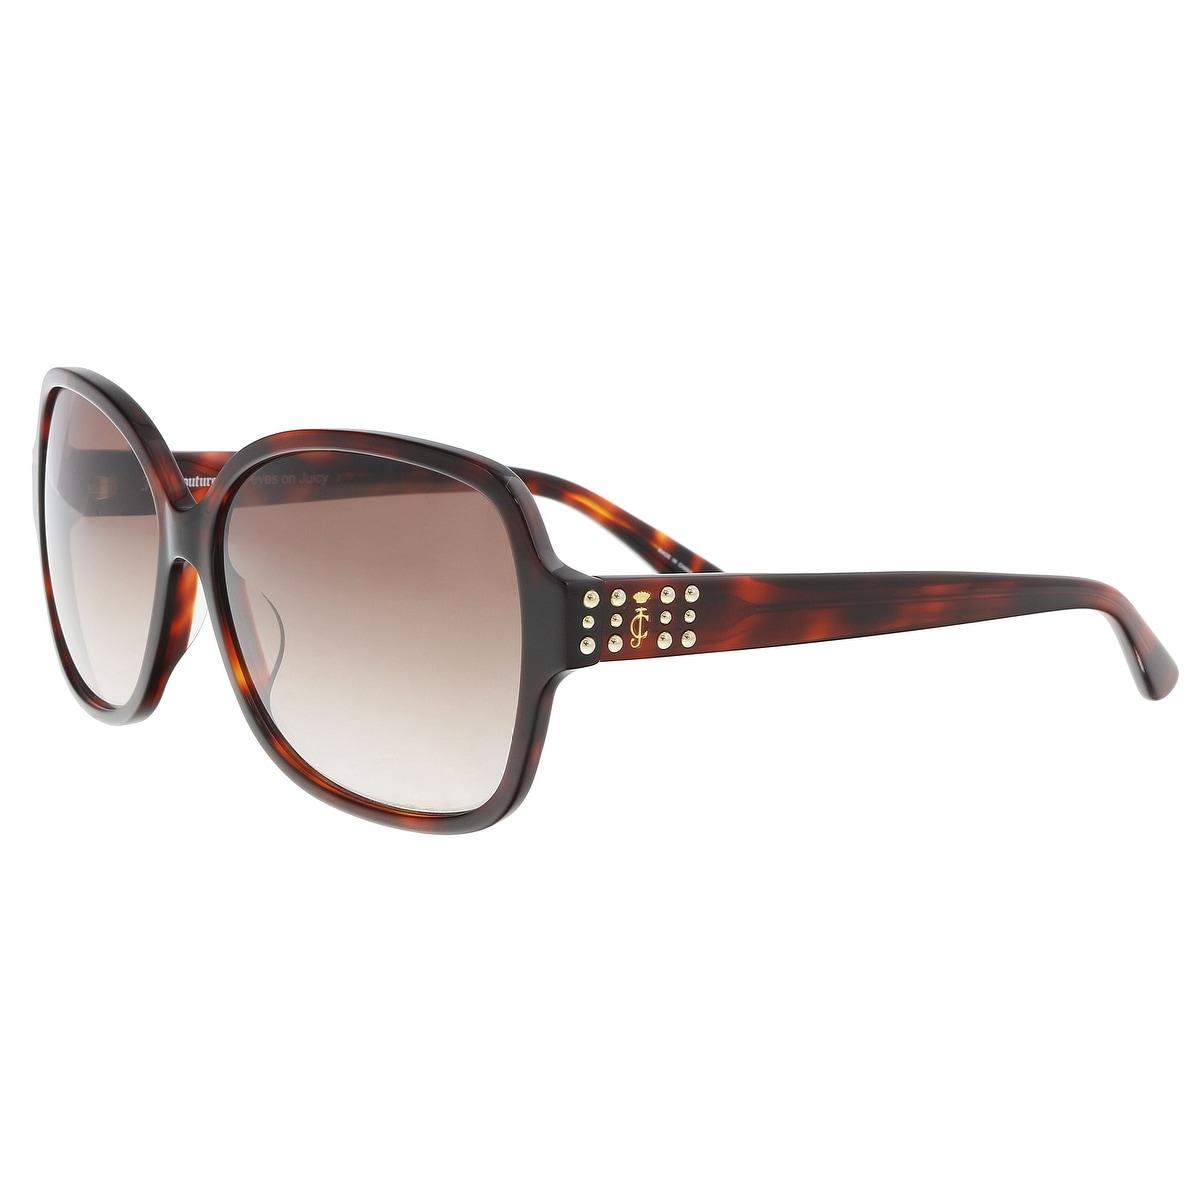 2c3a821e6c Juicy Couture JU 592 S 0086 HA Dark Havana Square Sunglasses - 57-14-135 - Free  Shipping Today - Overstock.com - 26932912